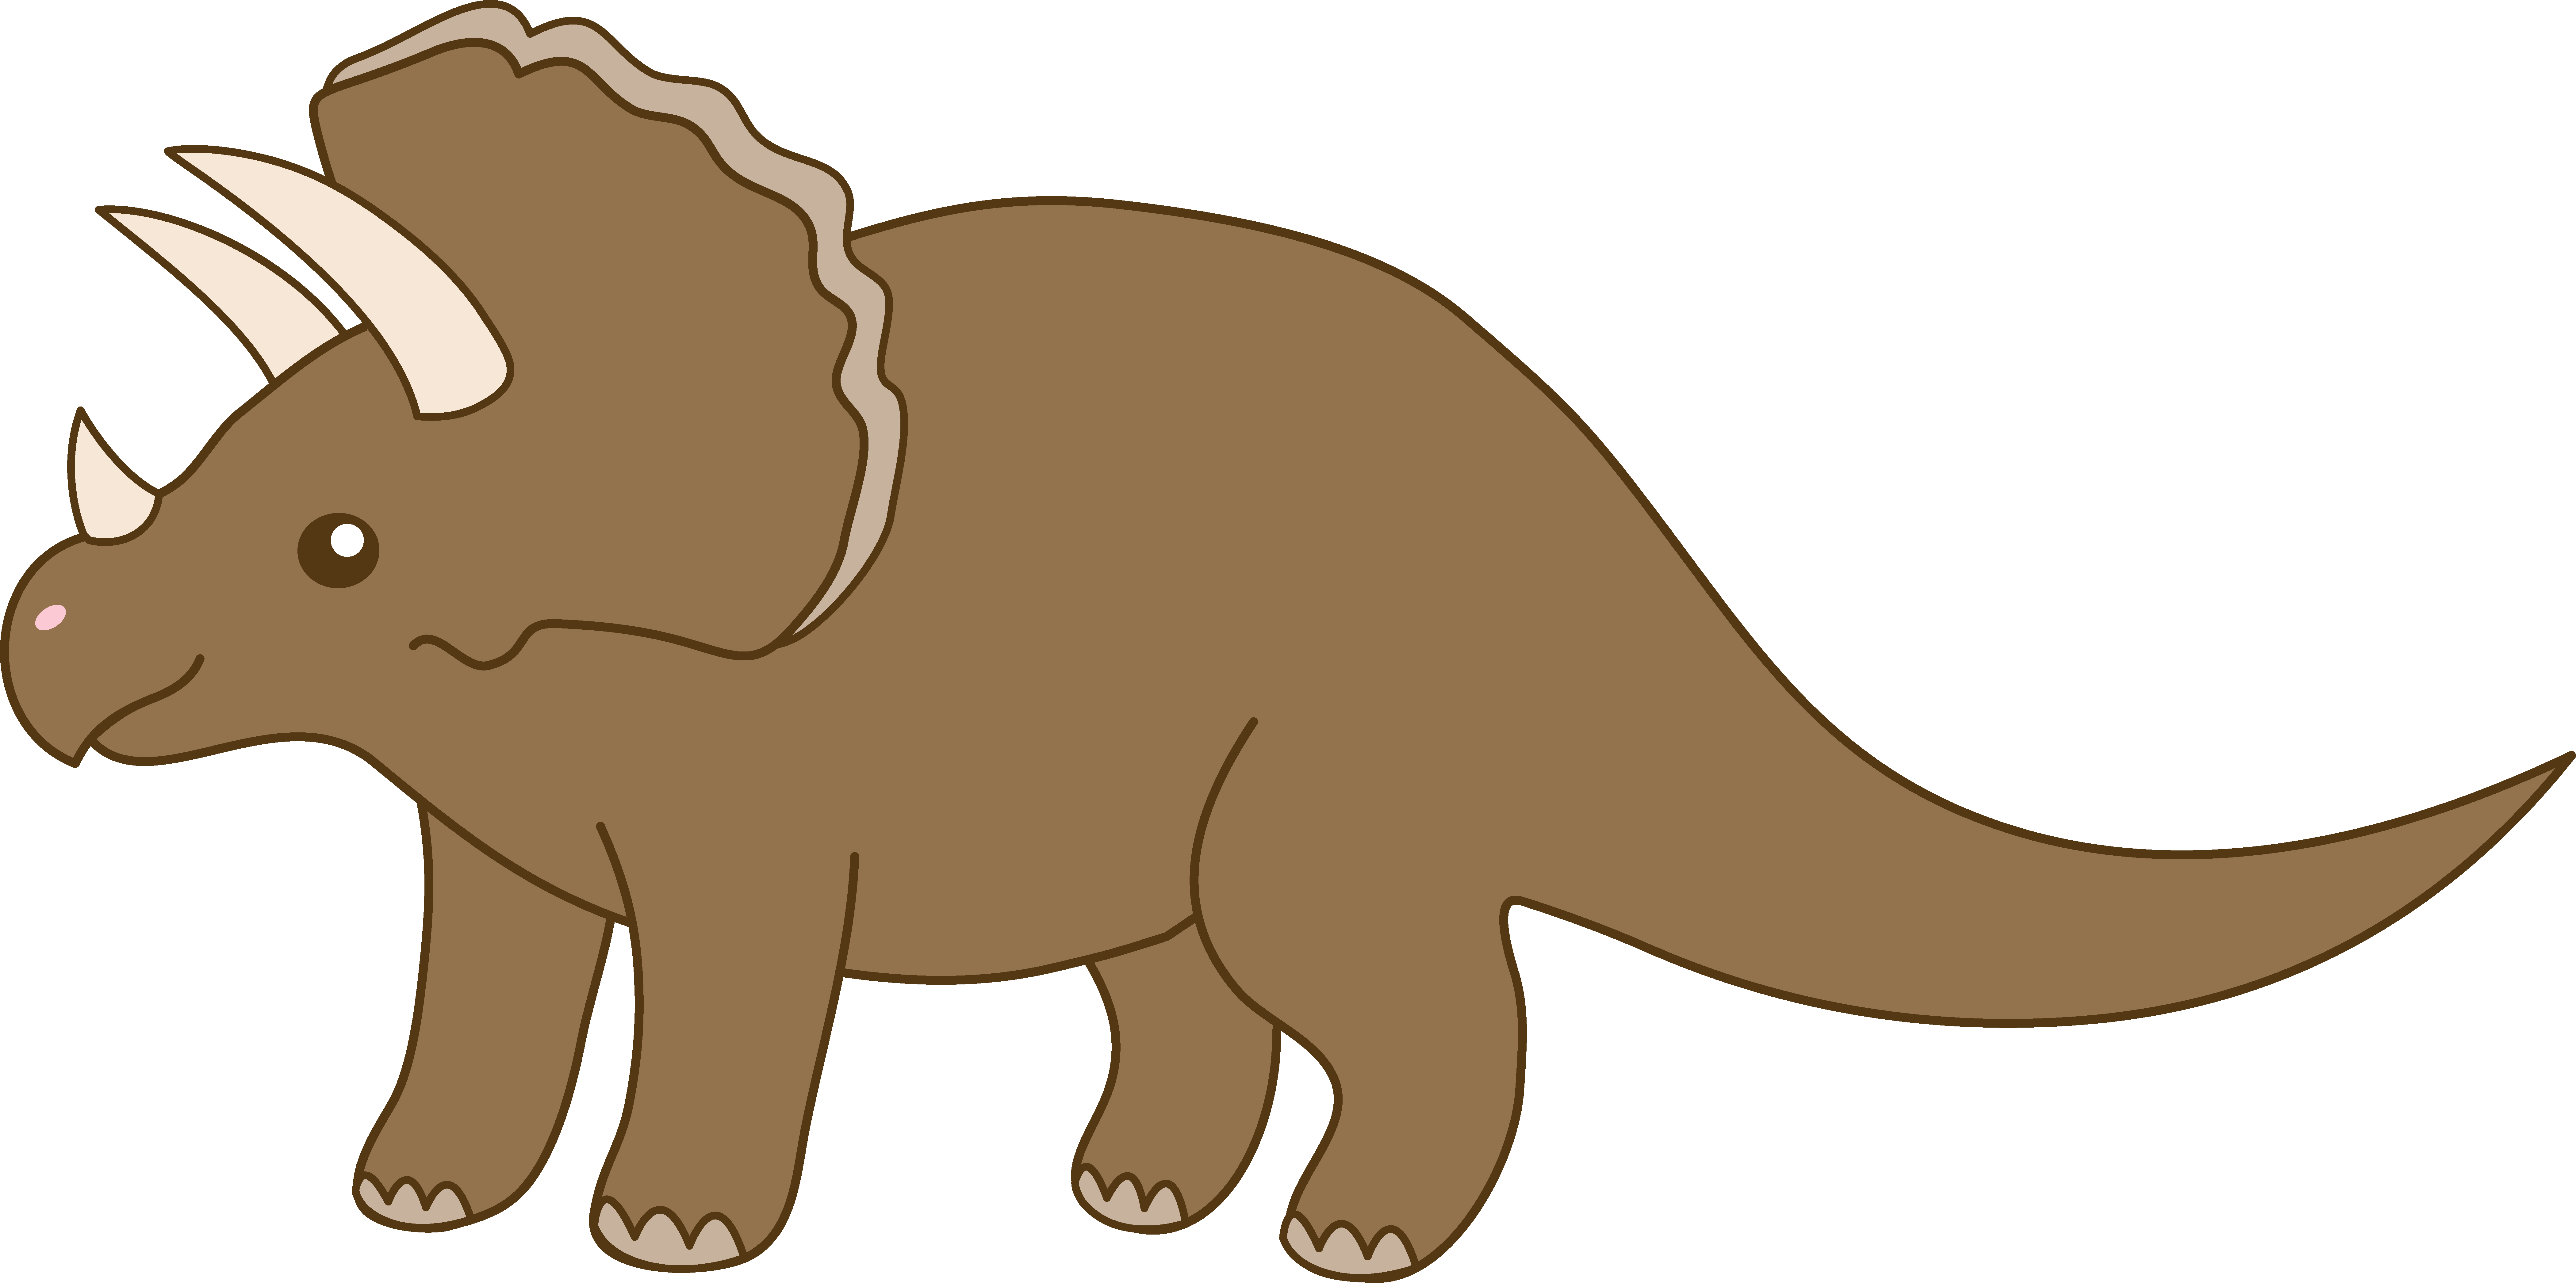 Dinosaurs Clipart-Dinosaurs clipart-12